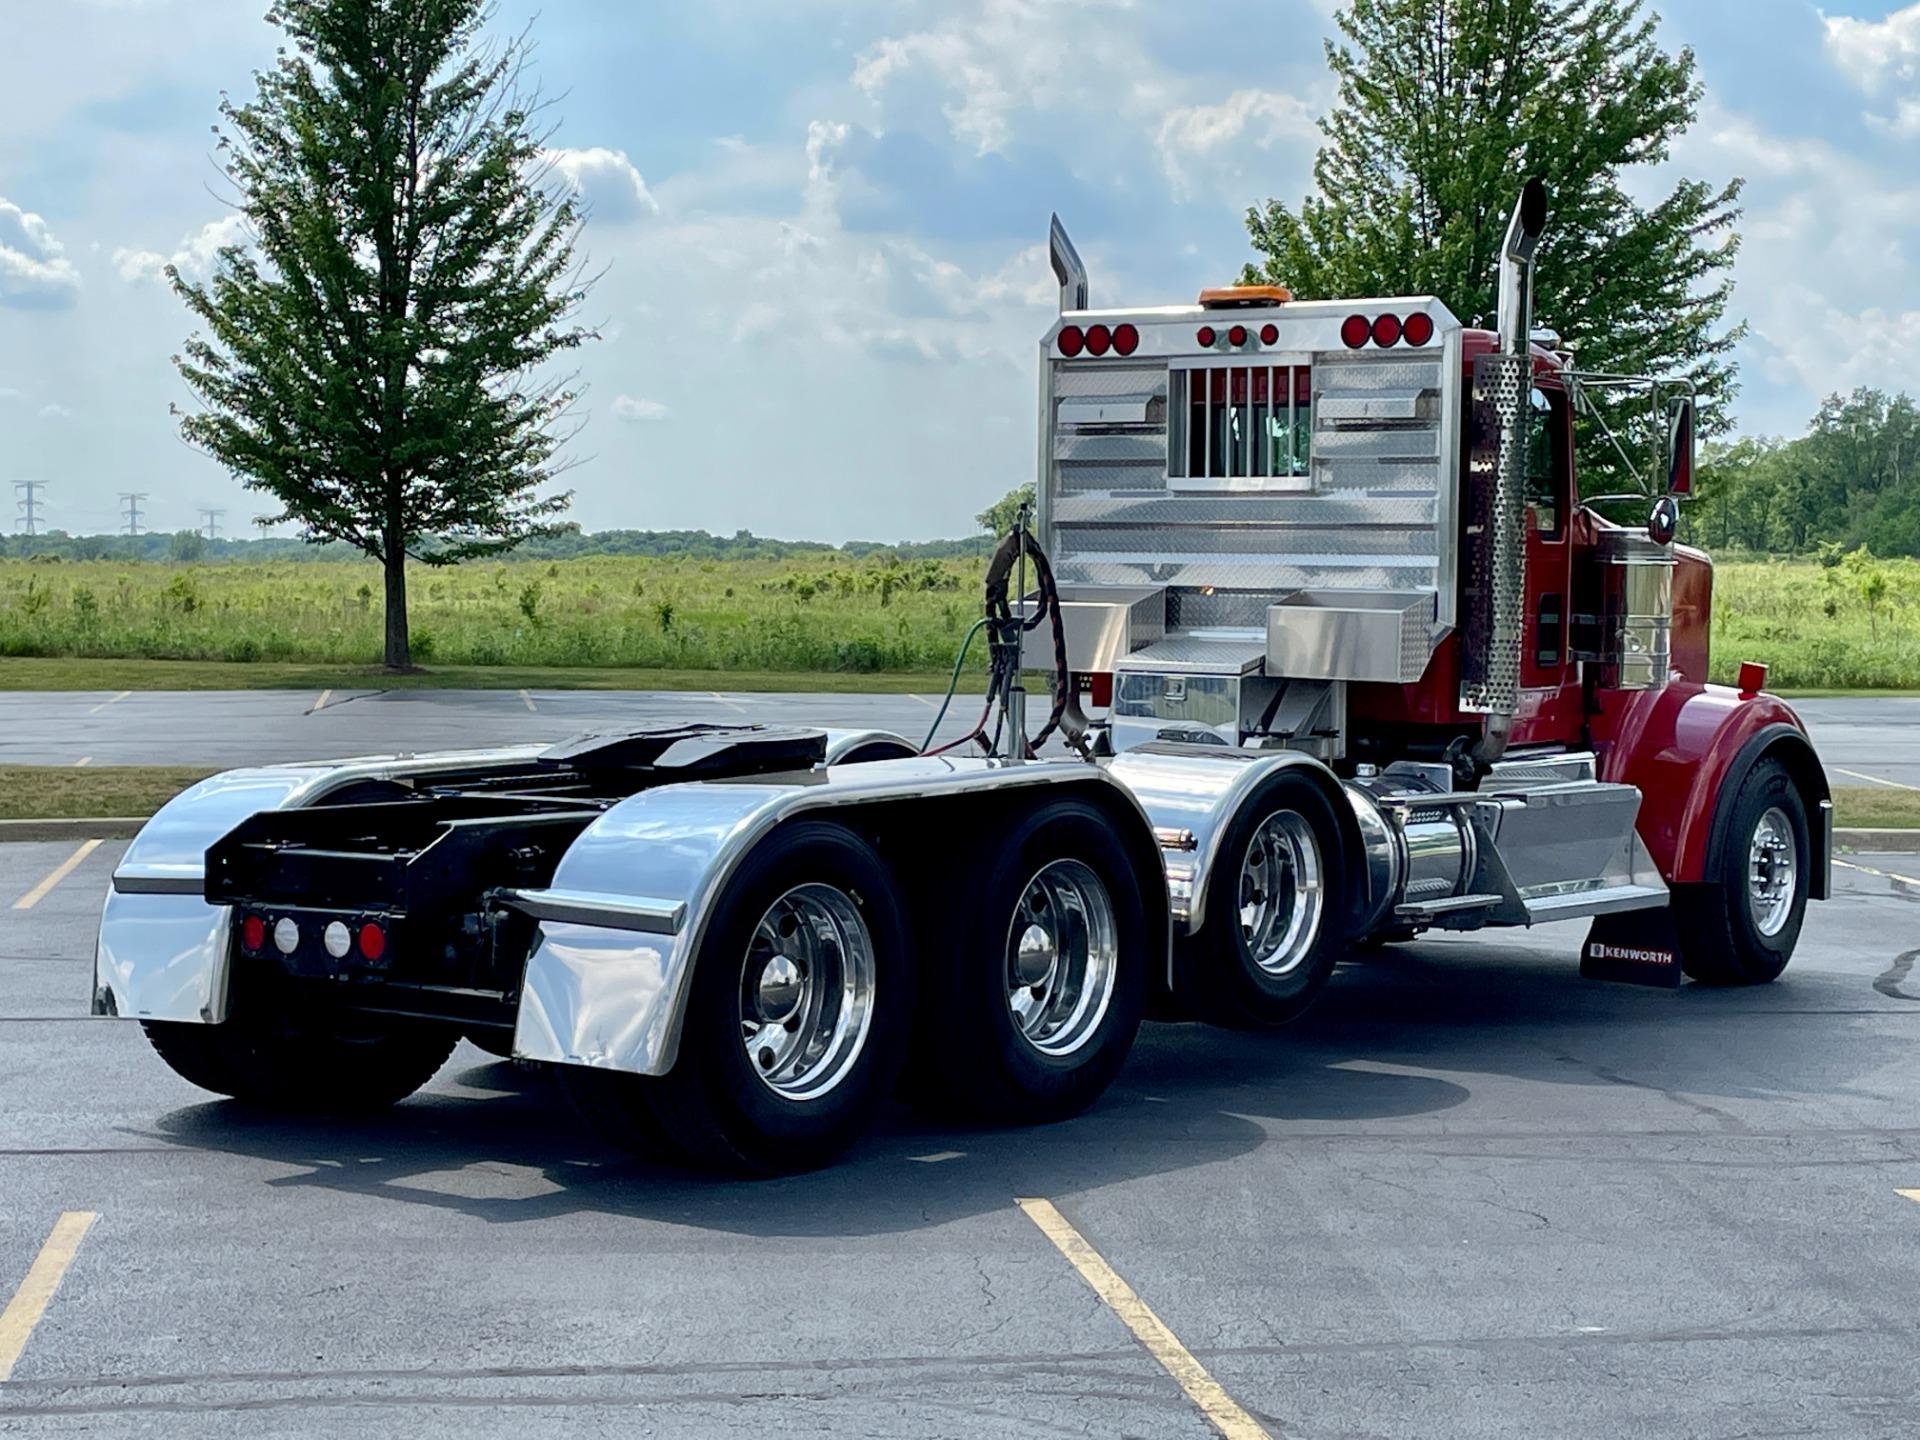 Used-2014-Kenworth-W900-Quad-Axle-Day-Cab---CUMMINS-ISX-550-Horsepower-13-Speed-Manual-Wet-Kit